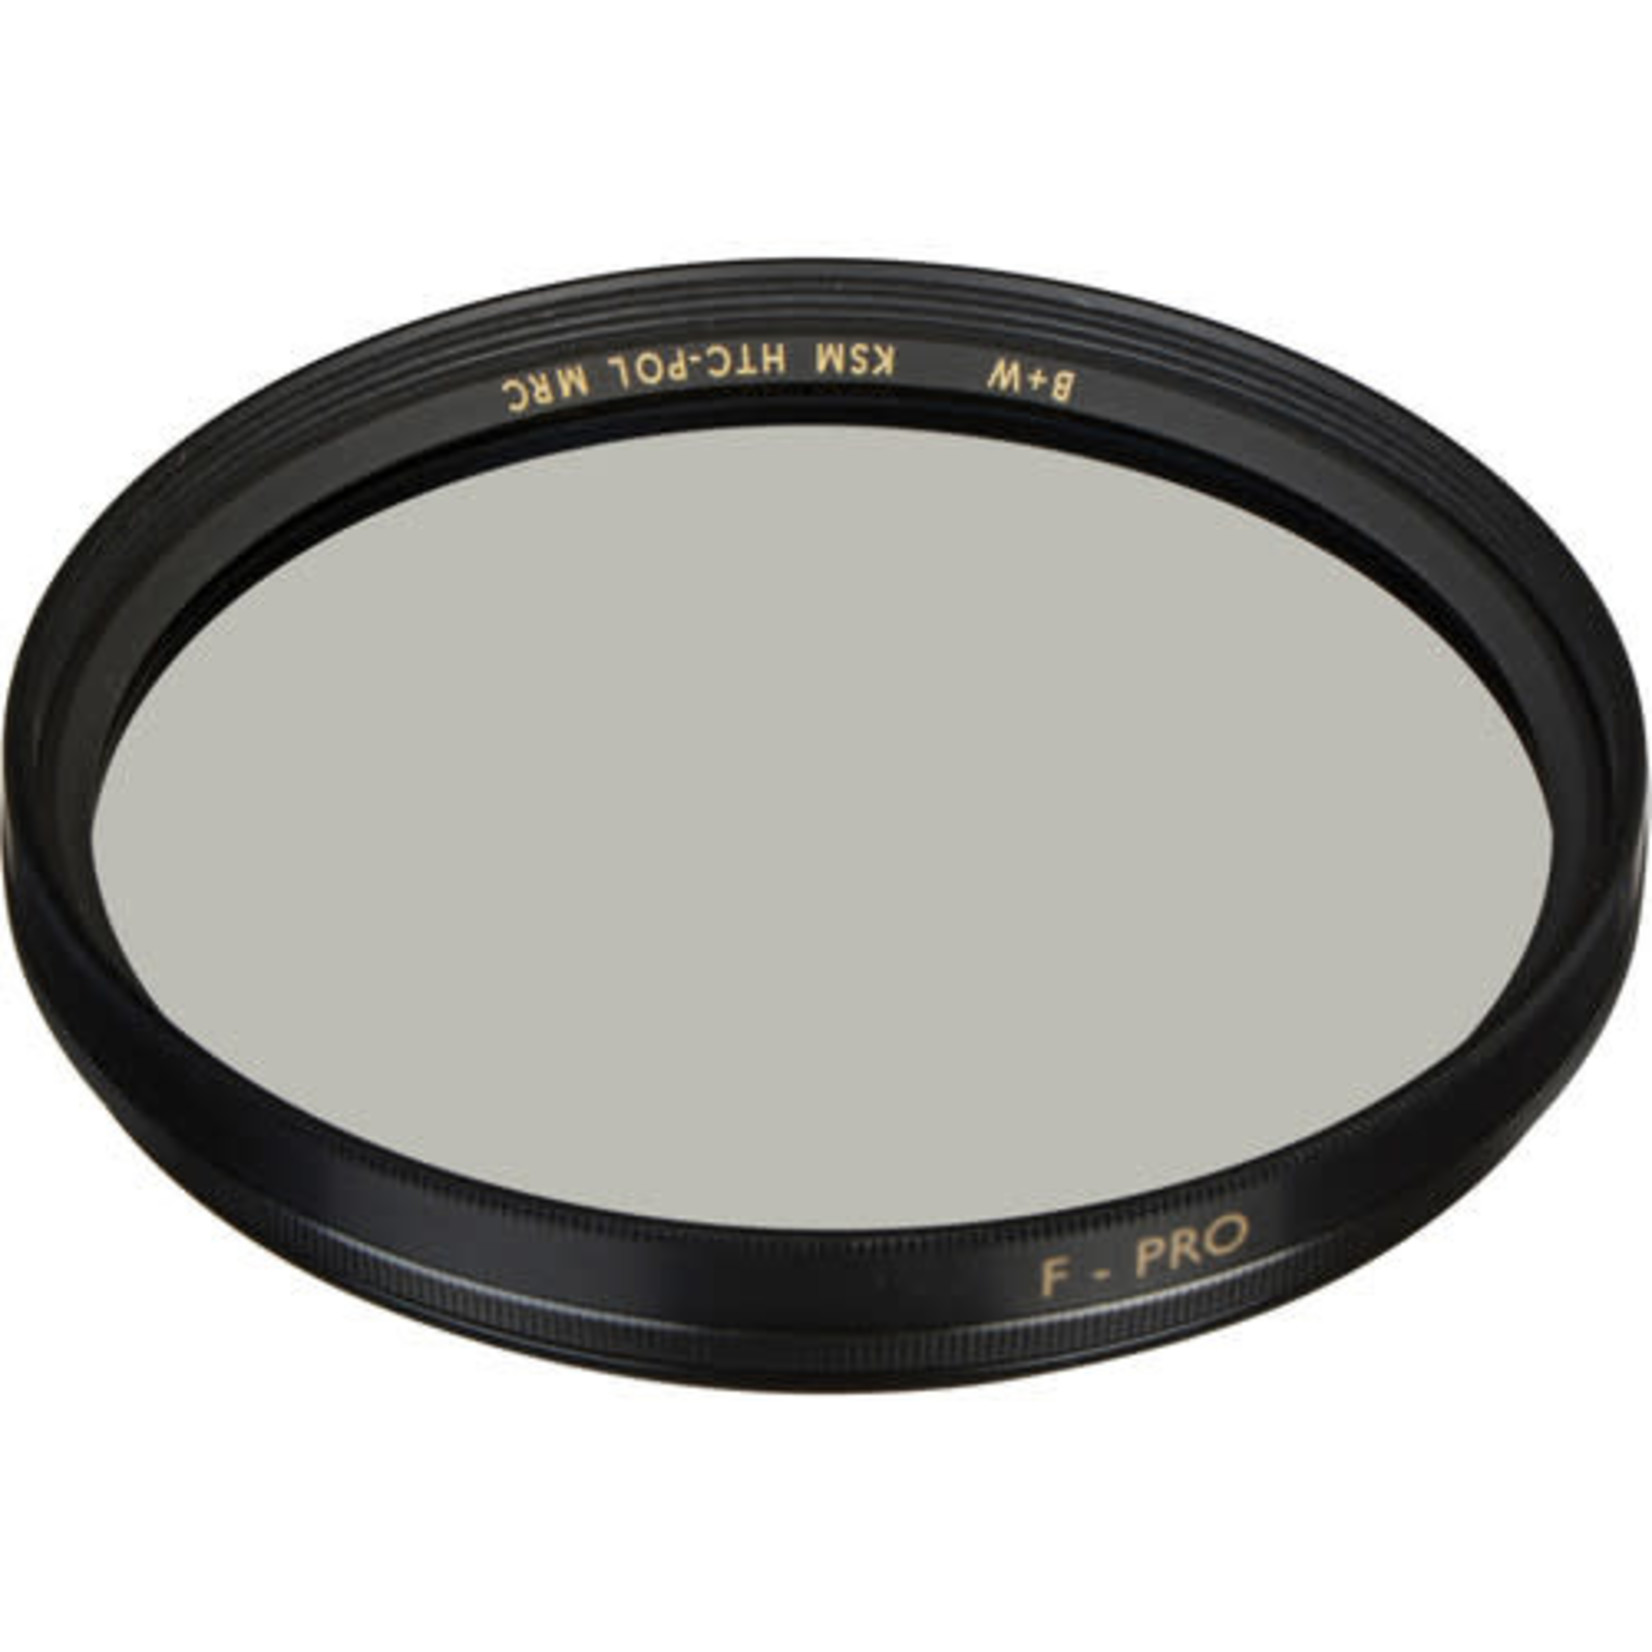 B+W B+W 46mm F-Pro Kaesemann High Transmission Circular Polarizer MRC Filter